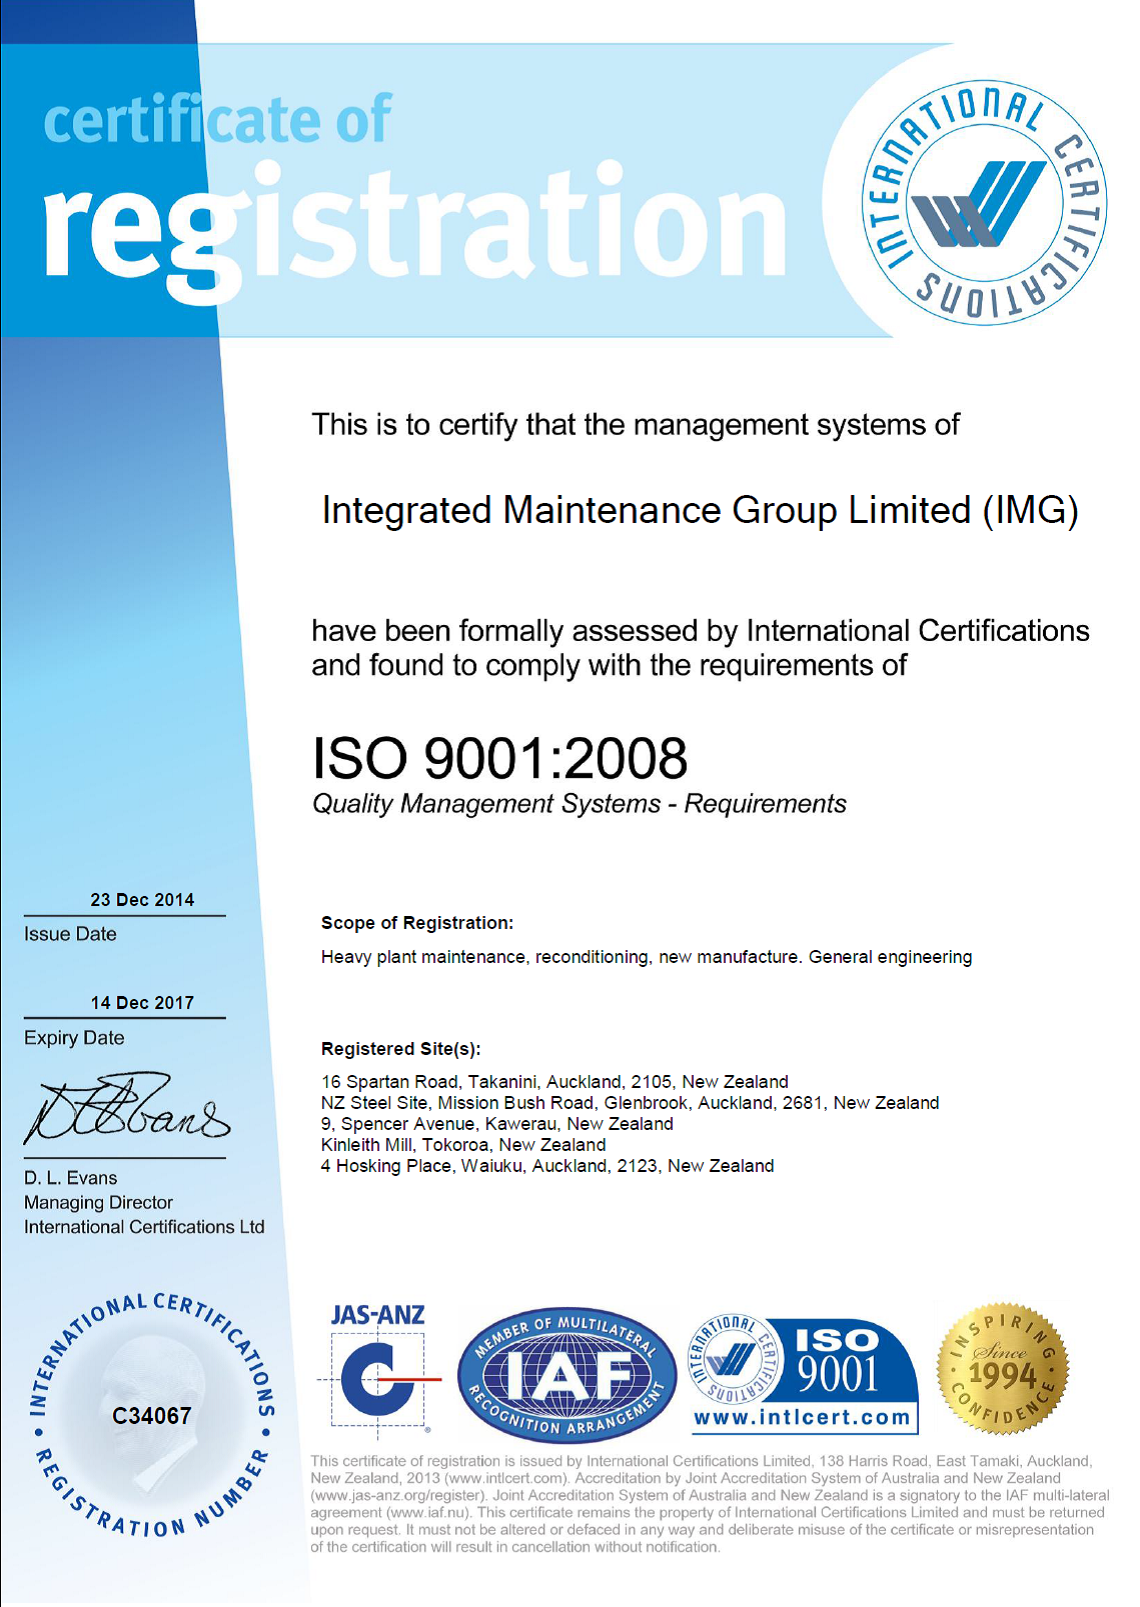 IMG Certificate of Registration